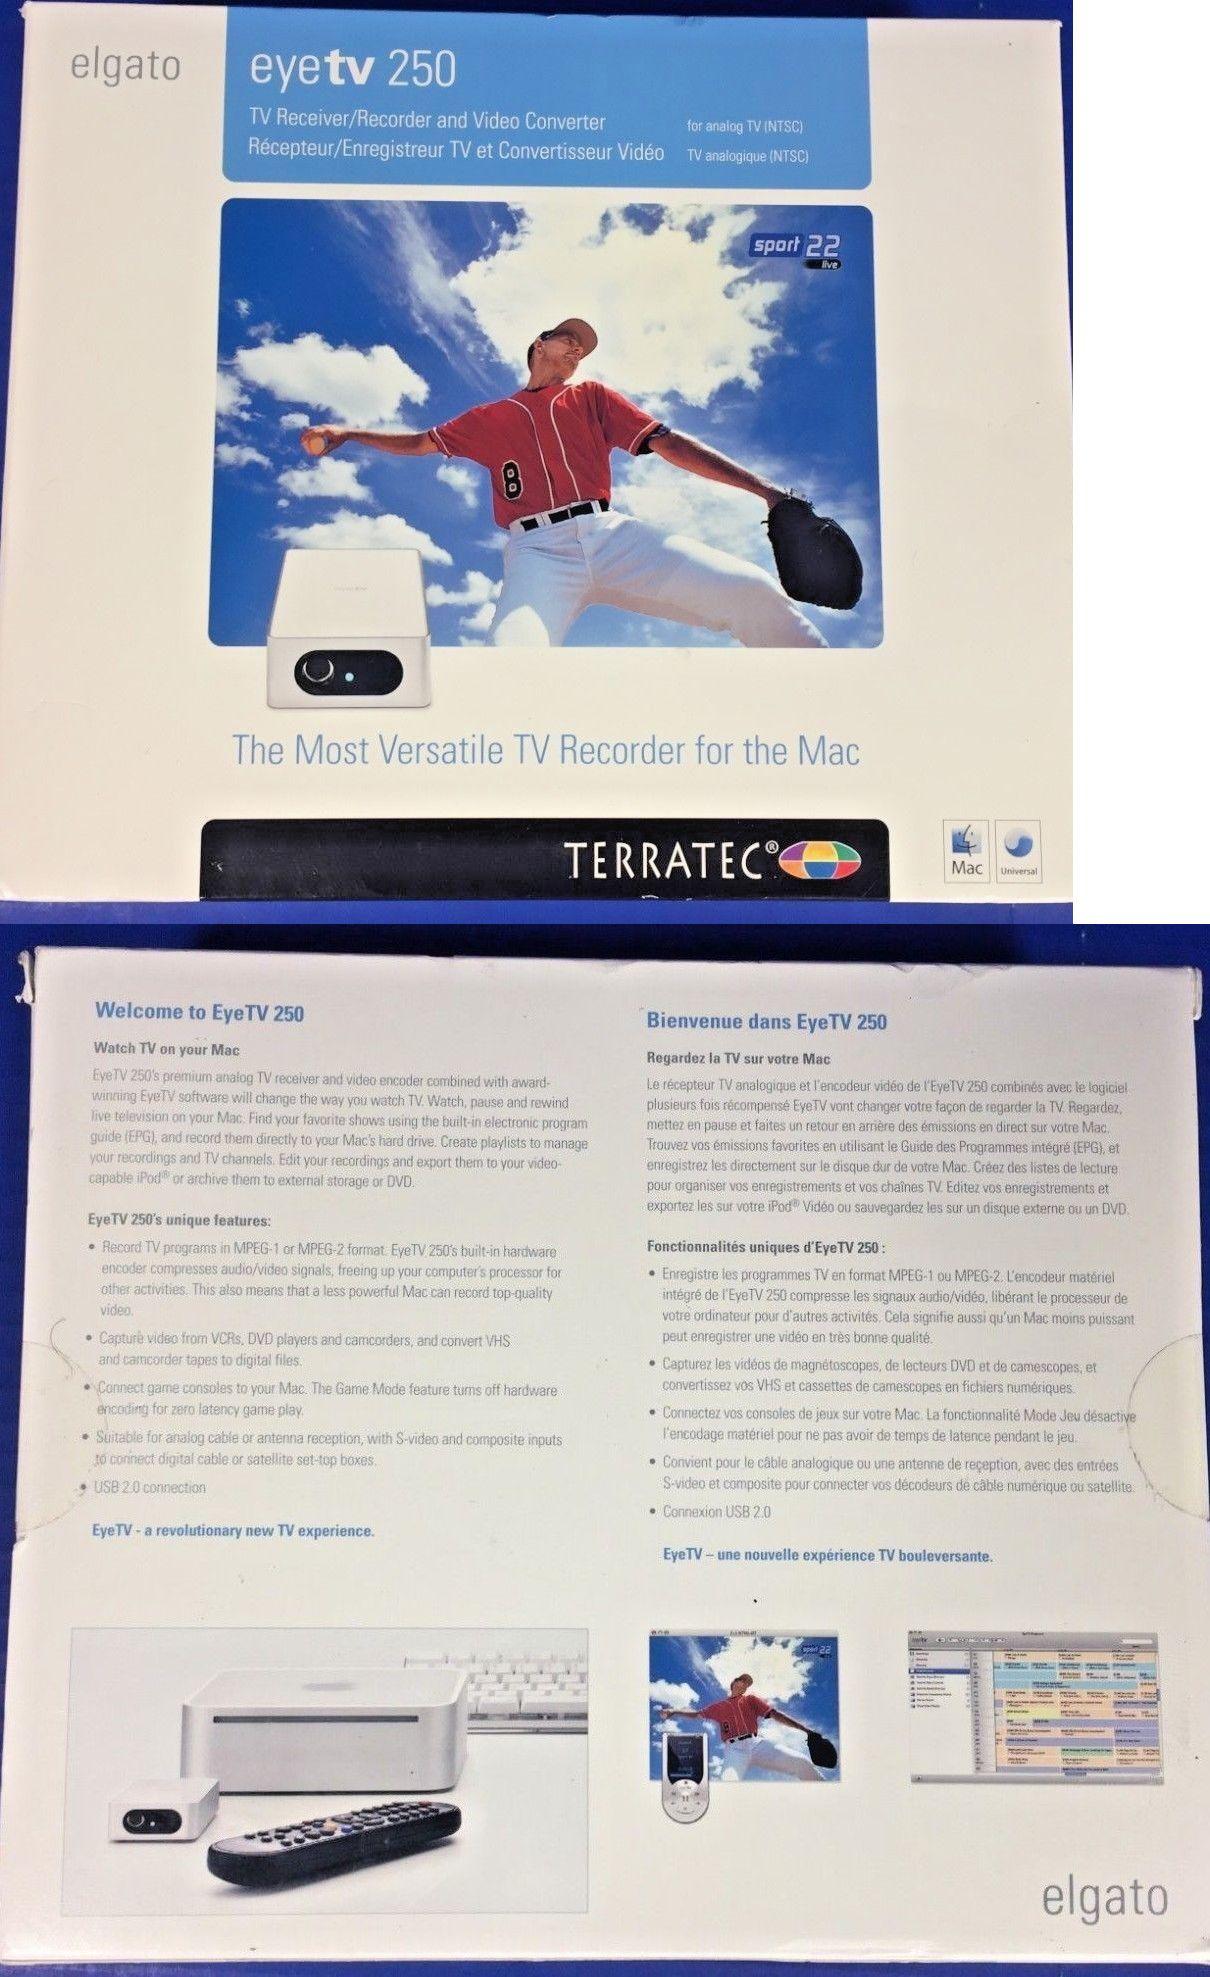 TV Tuner Video Capture Devices 175679: Elgato Eyetv 250